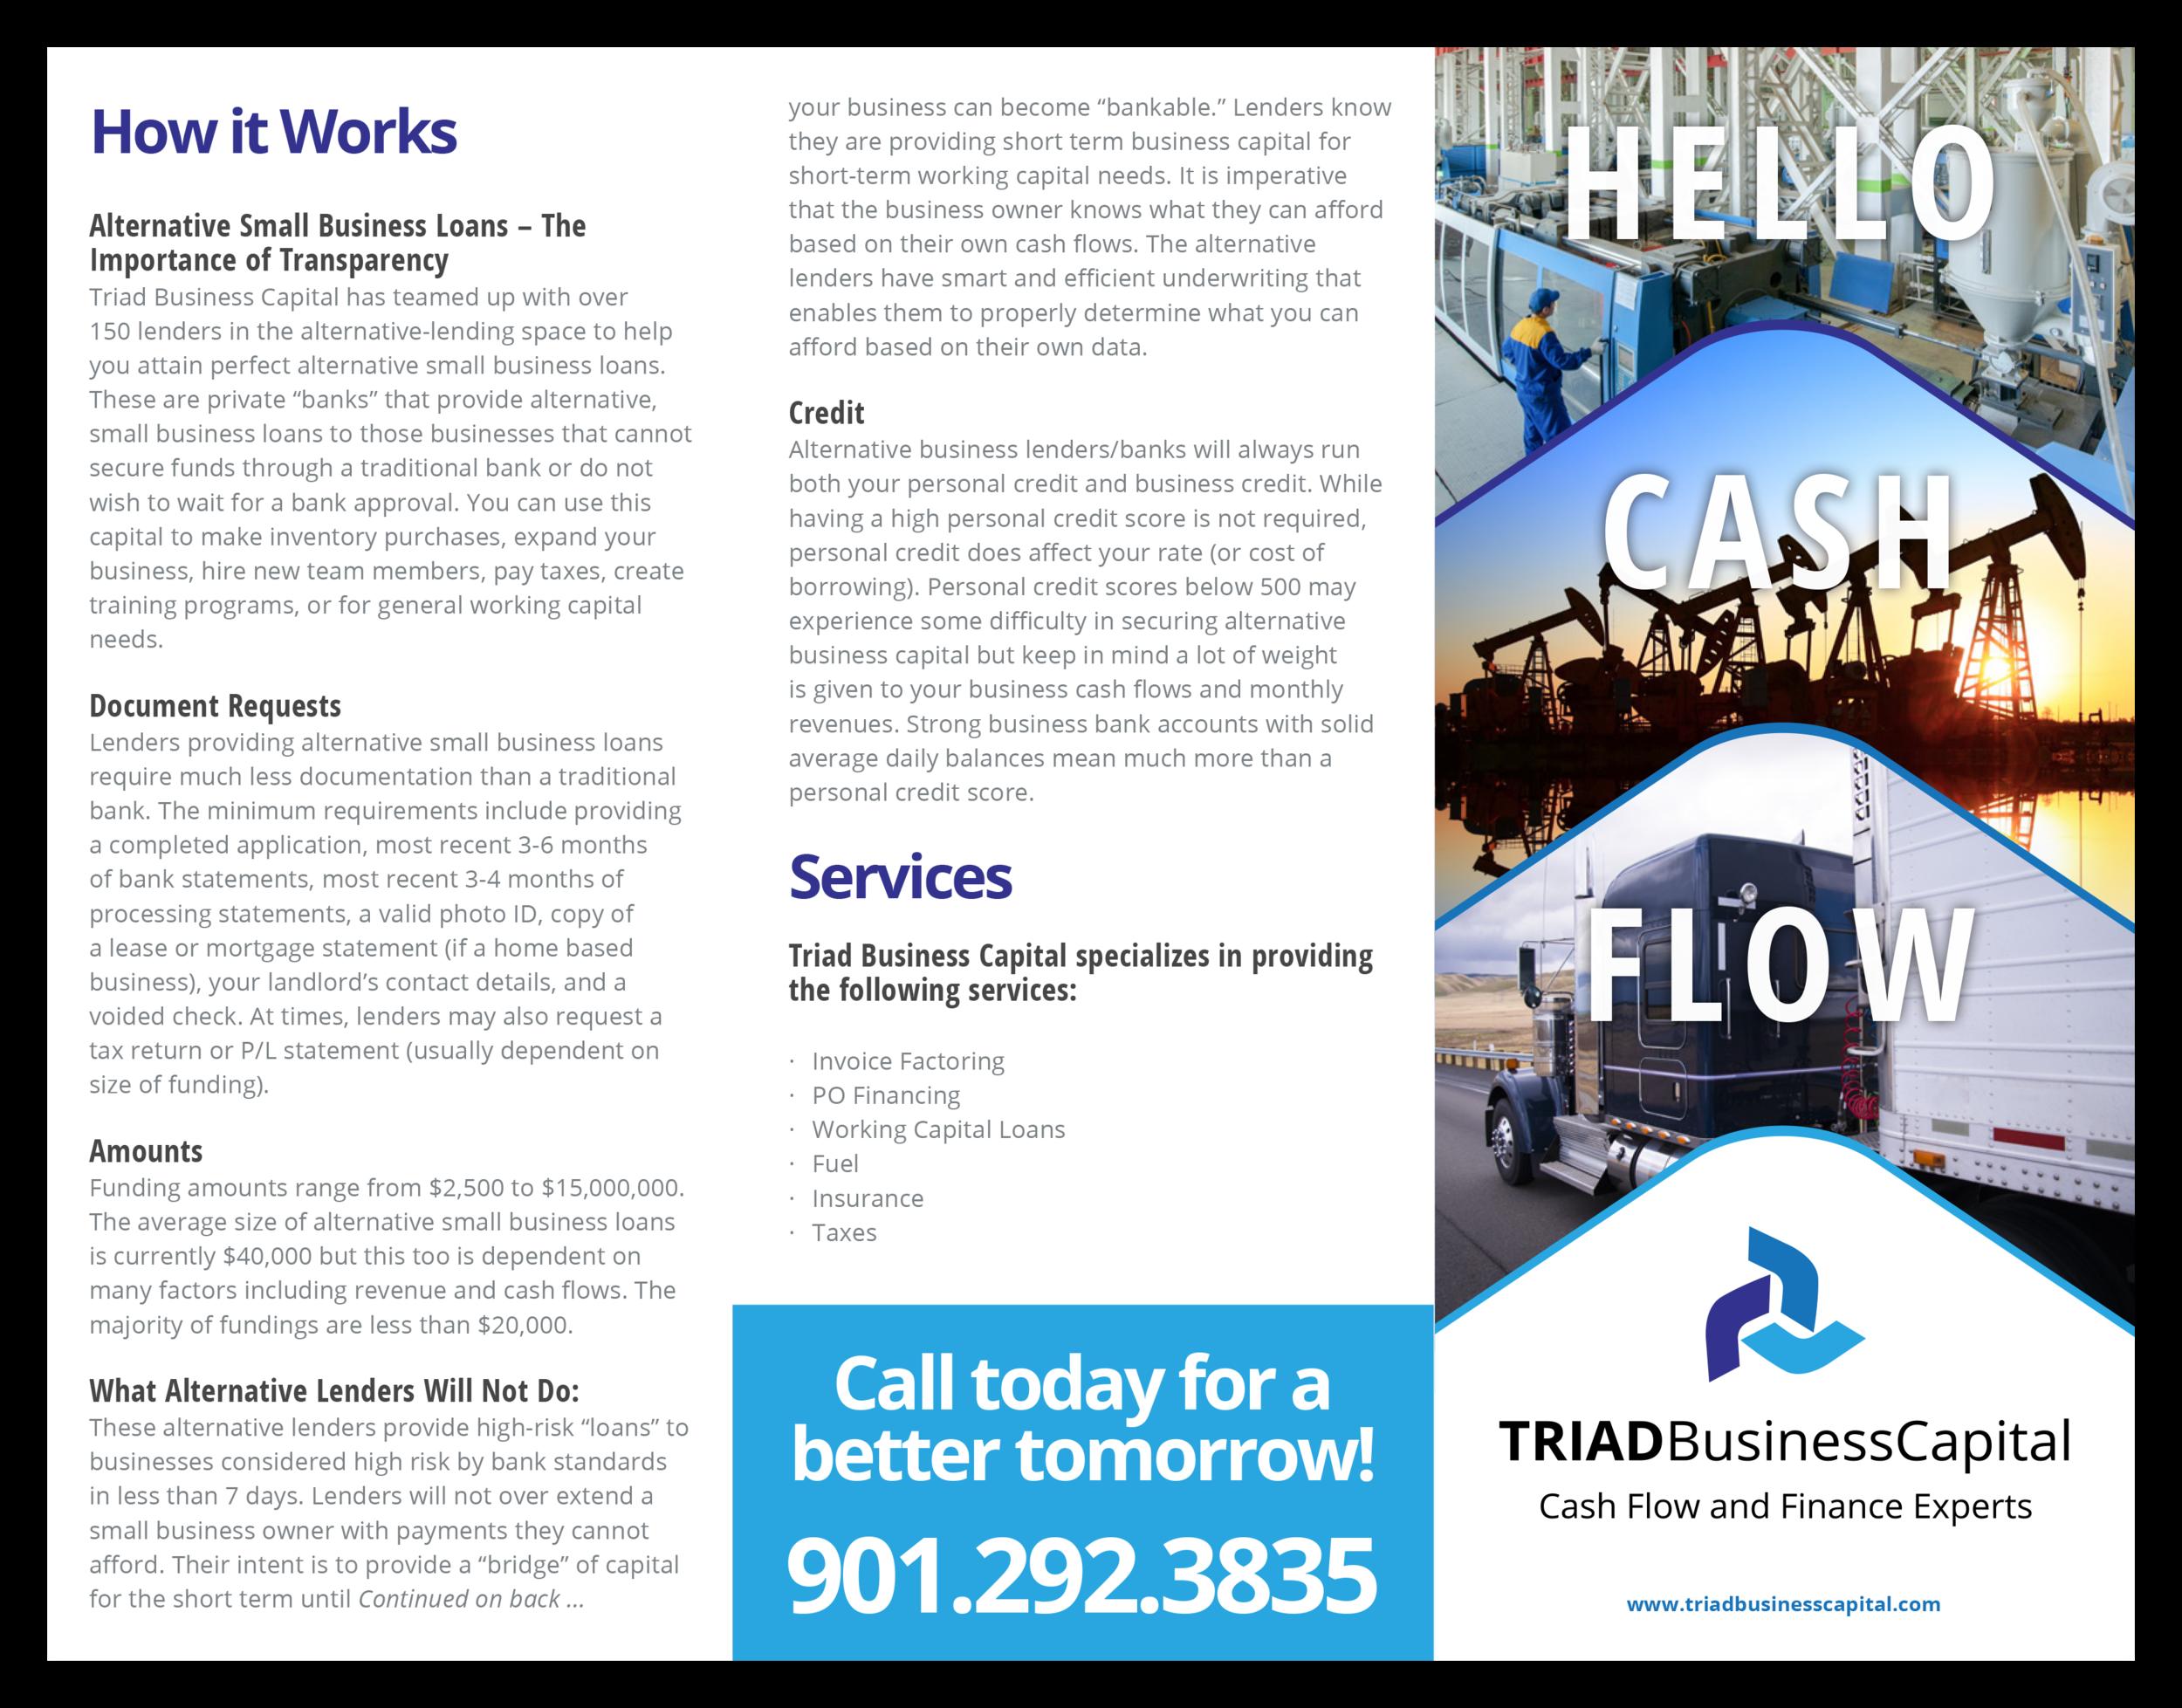 Triad-Business-Capital_Brochire-Design_Print-Design_Dreamcapture_Memphis-TN